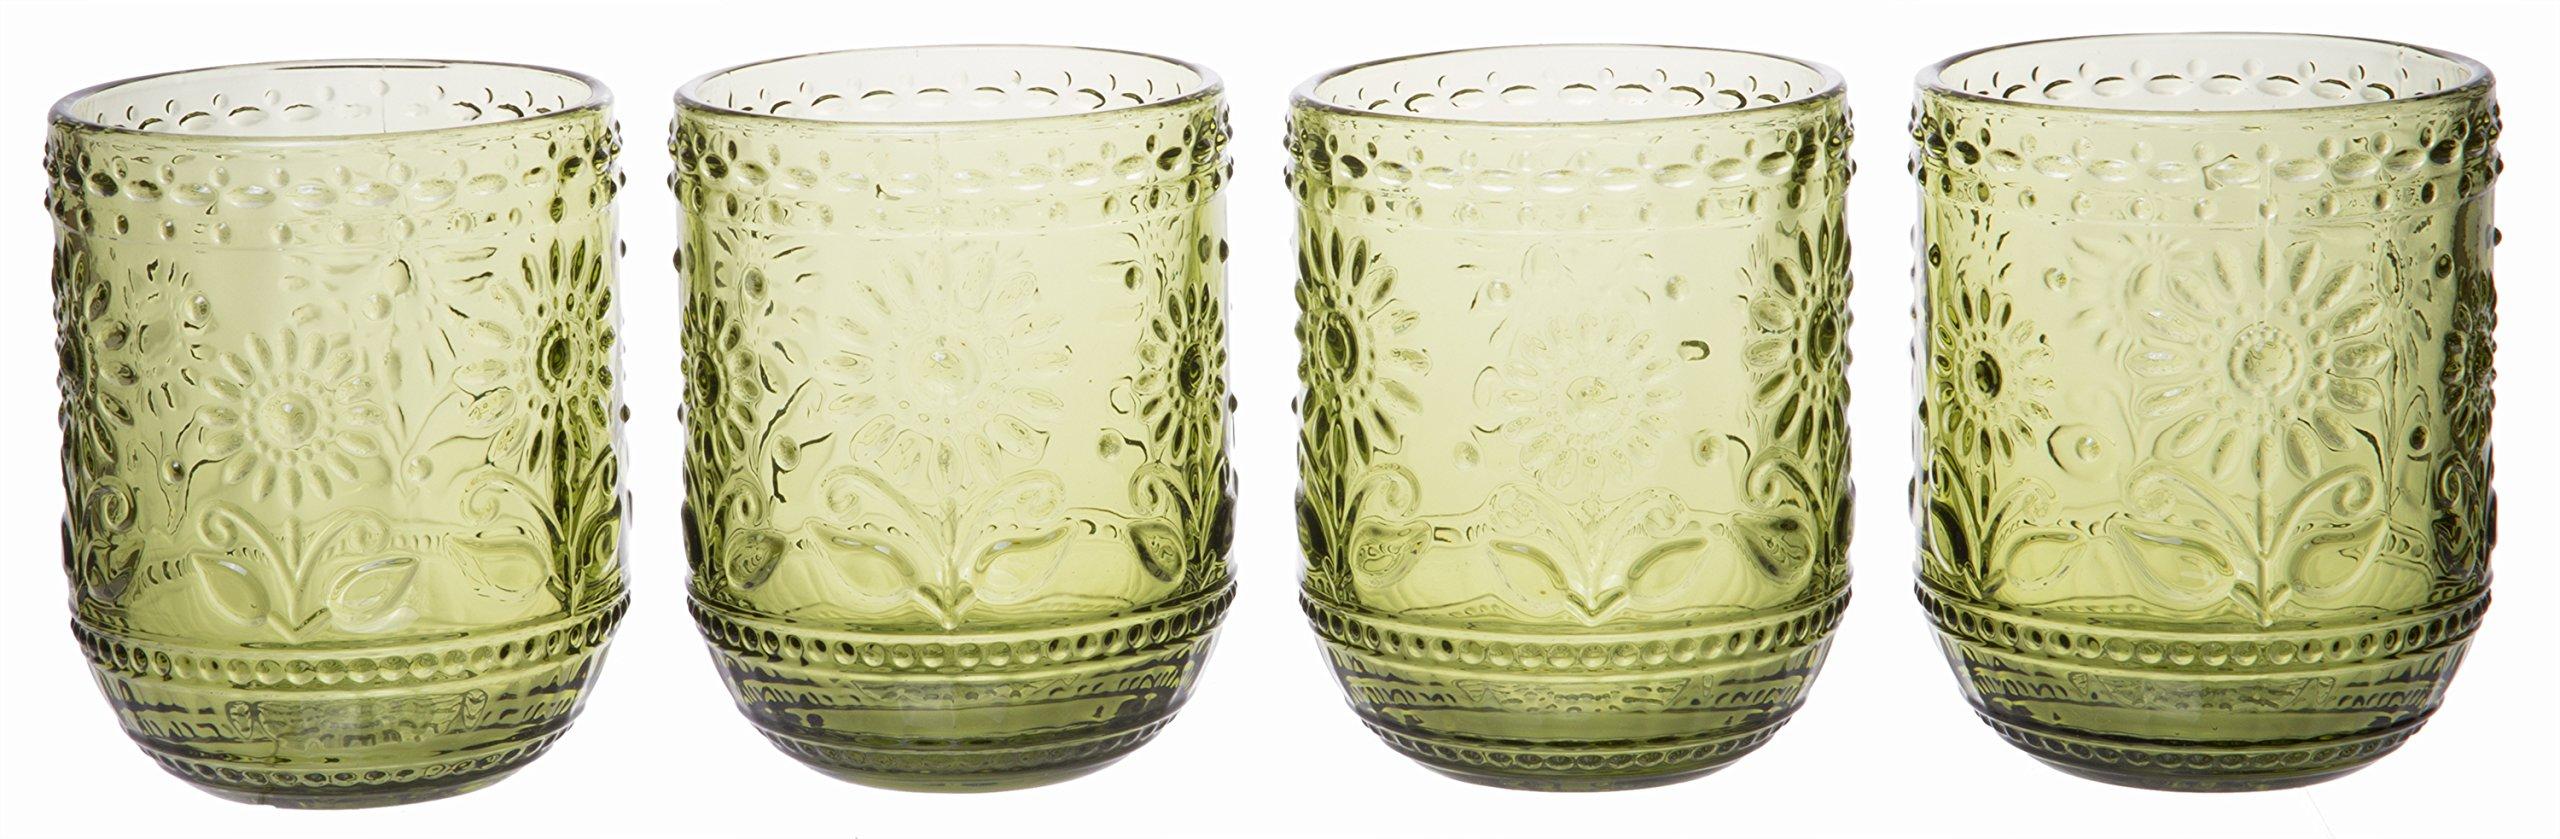 Vintage Botanist Drinking Glass Set, Luxurious Floral Embossed Decorative Green Glassware, Set of 4, 4-inch, 12 oz